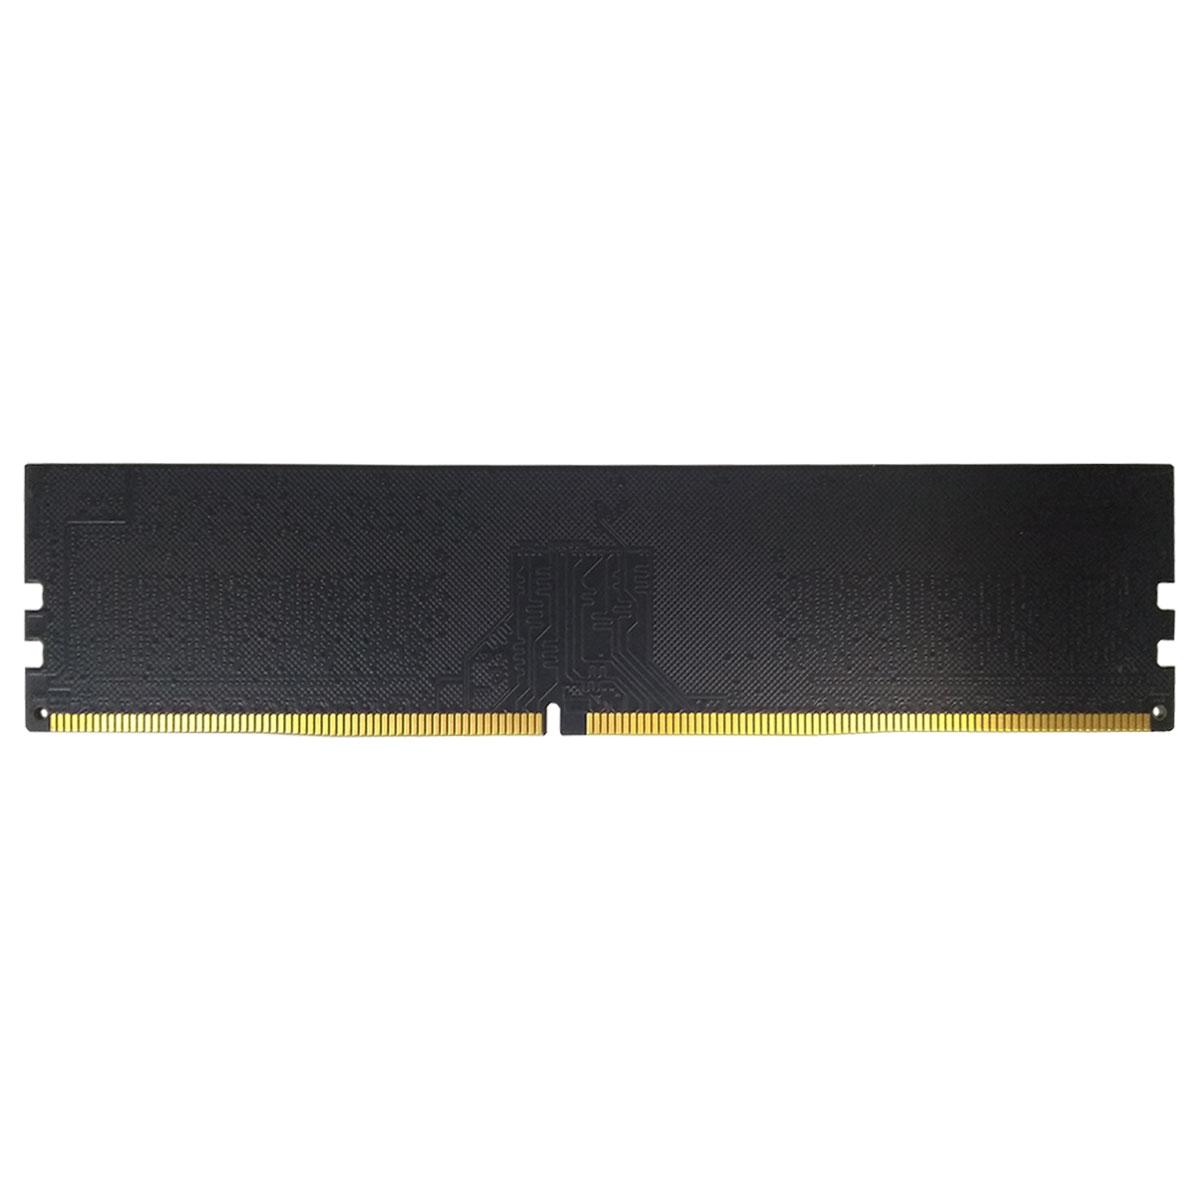 Memória KTROK KTROK4G2400 4GB, DDR4, 2400MHz, CL17